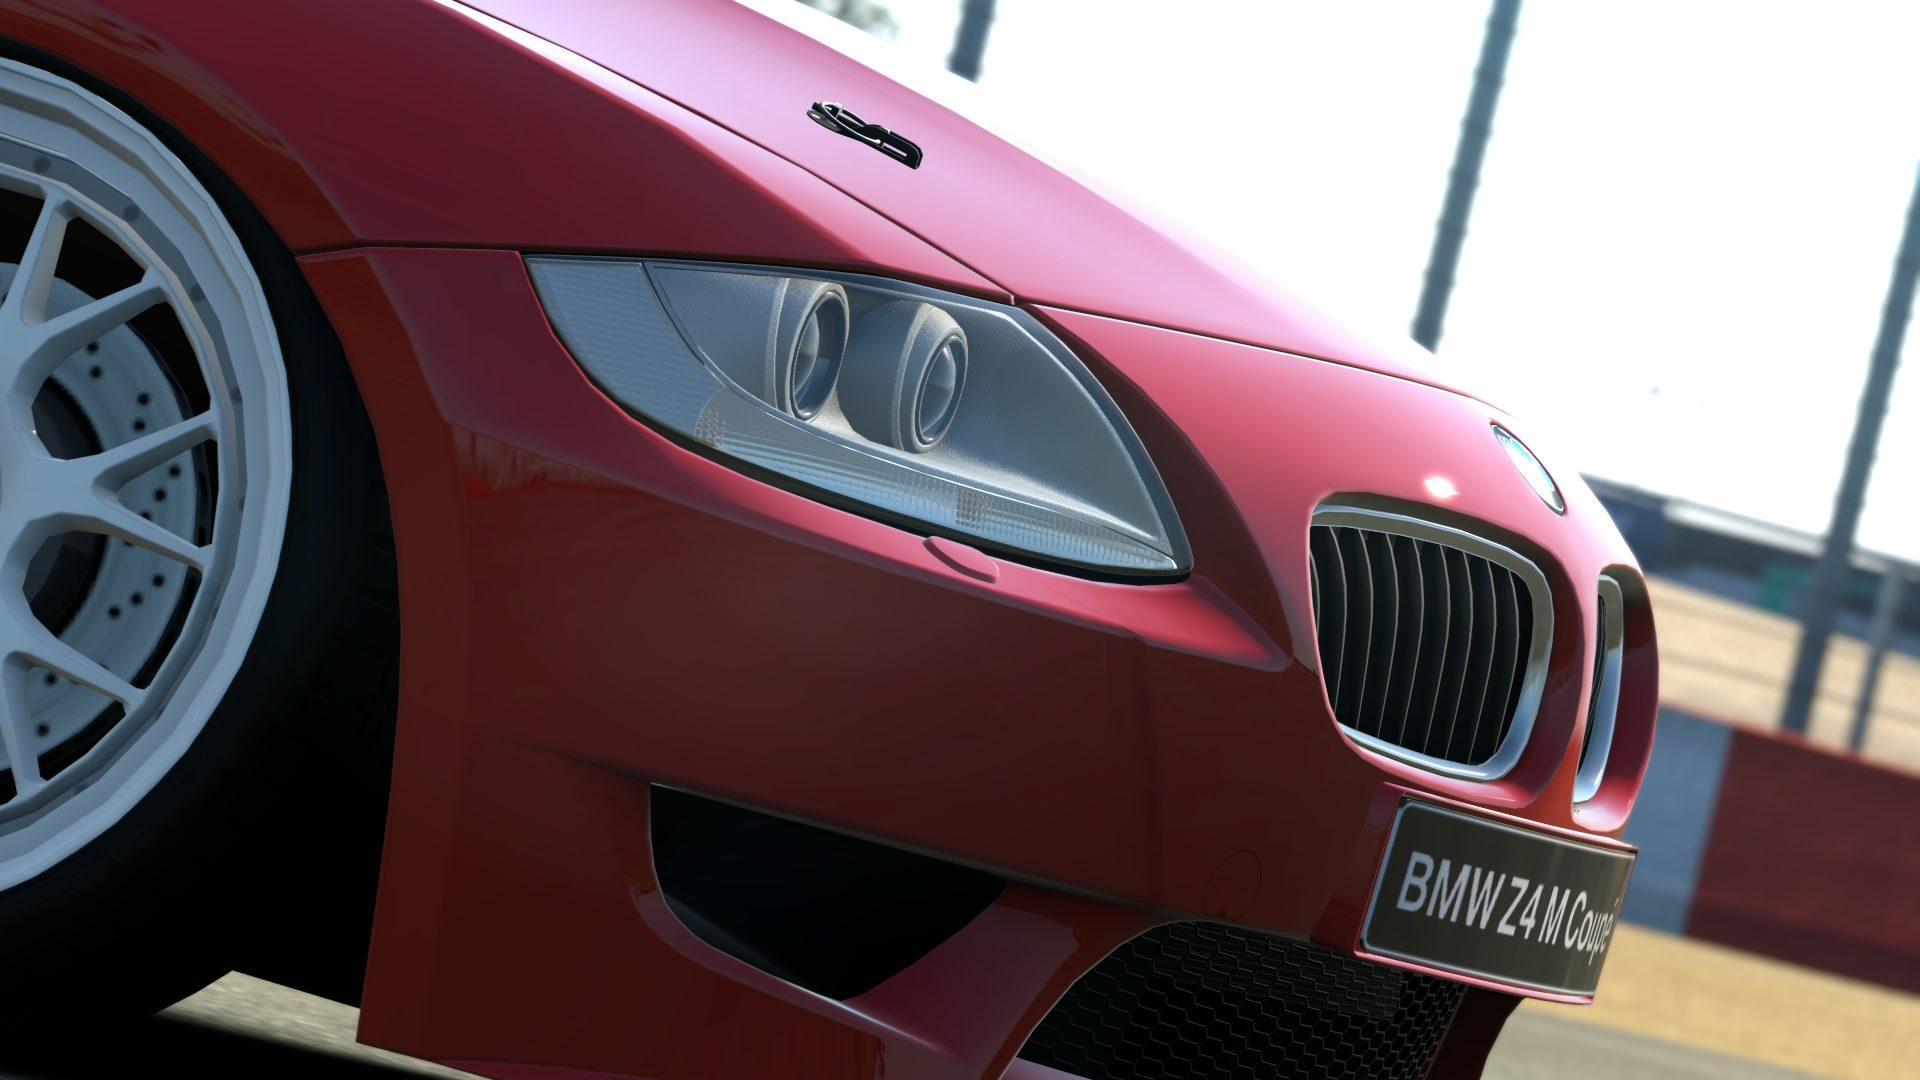 BMW Z4 Silverstone Grand Prix Circuit_5.jpg